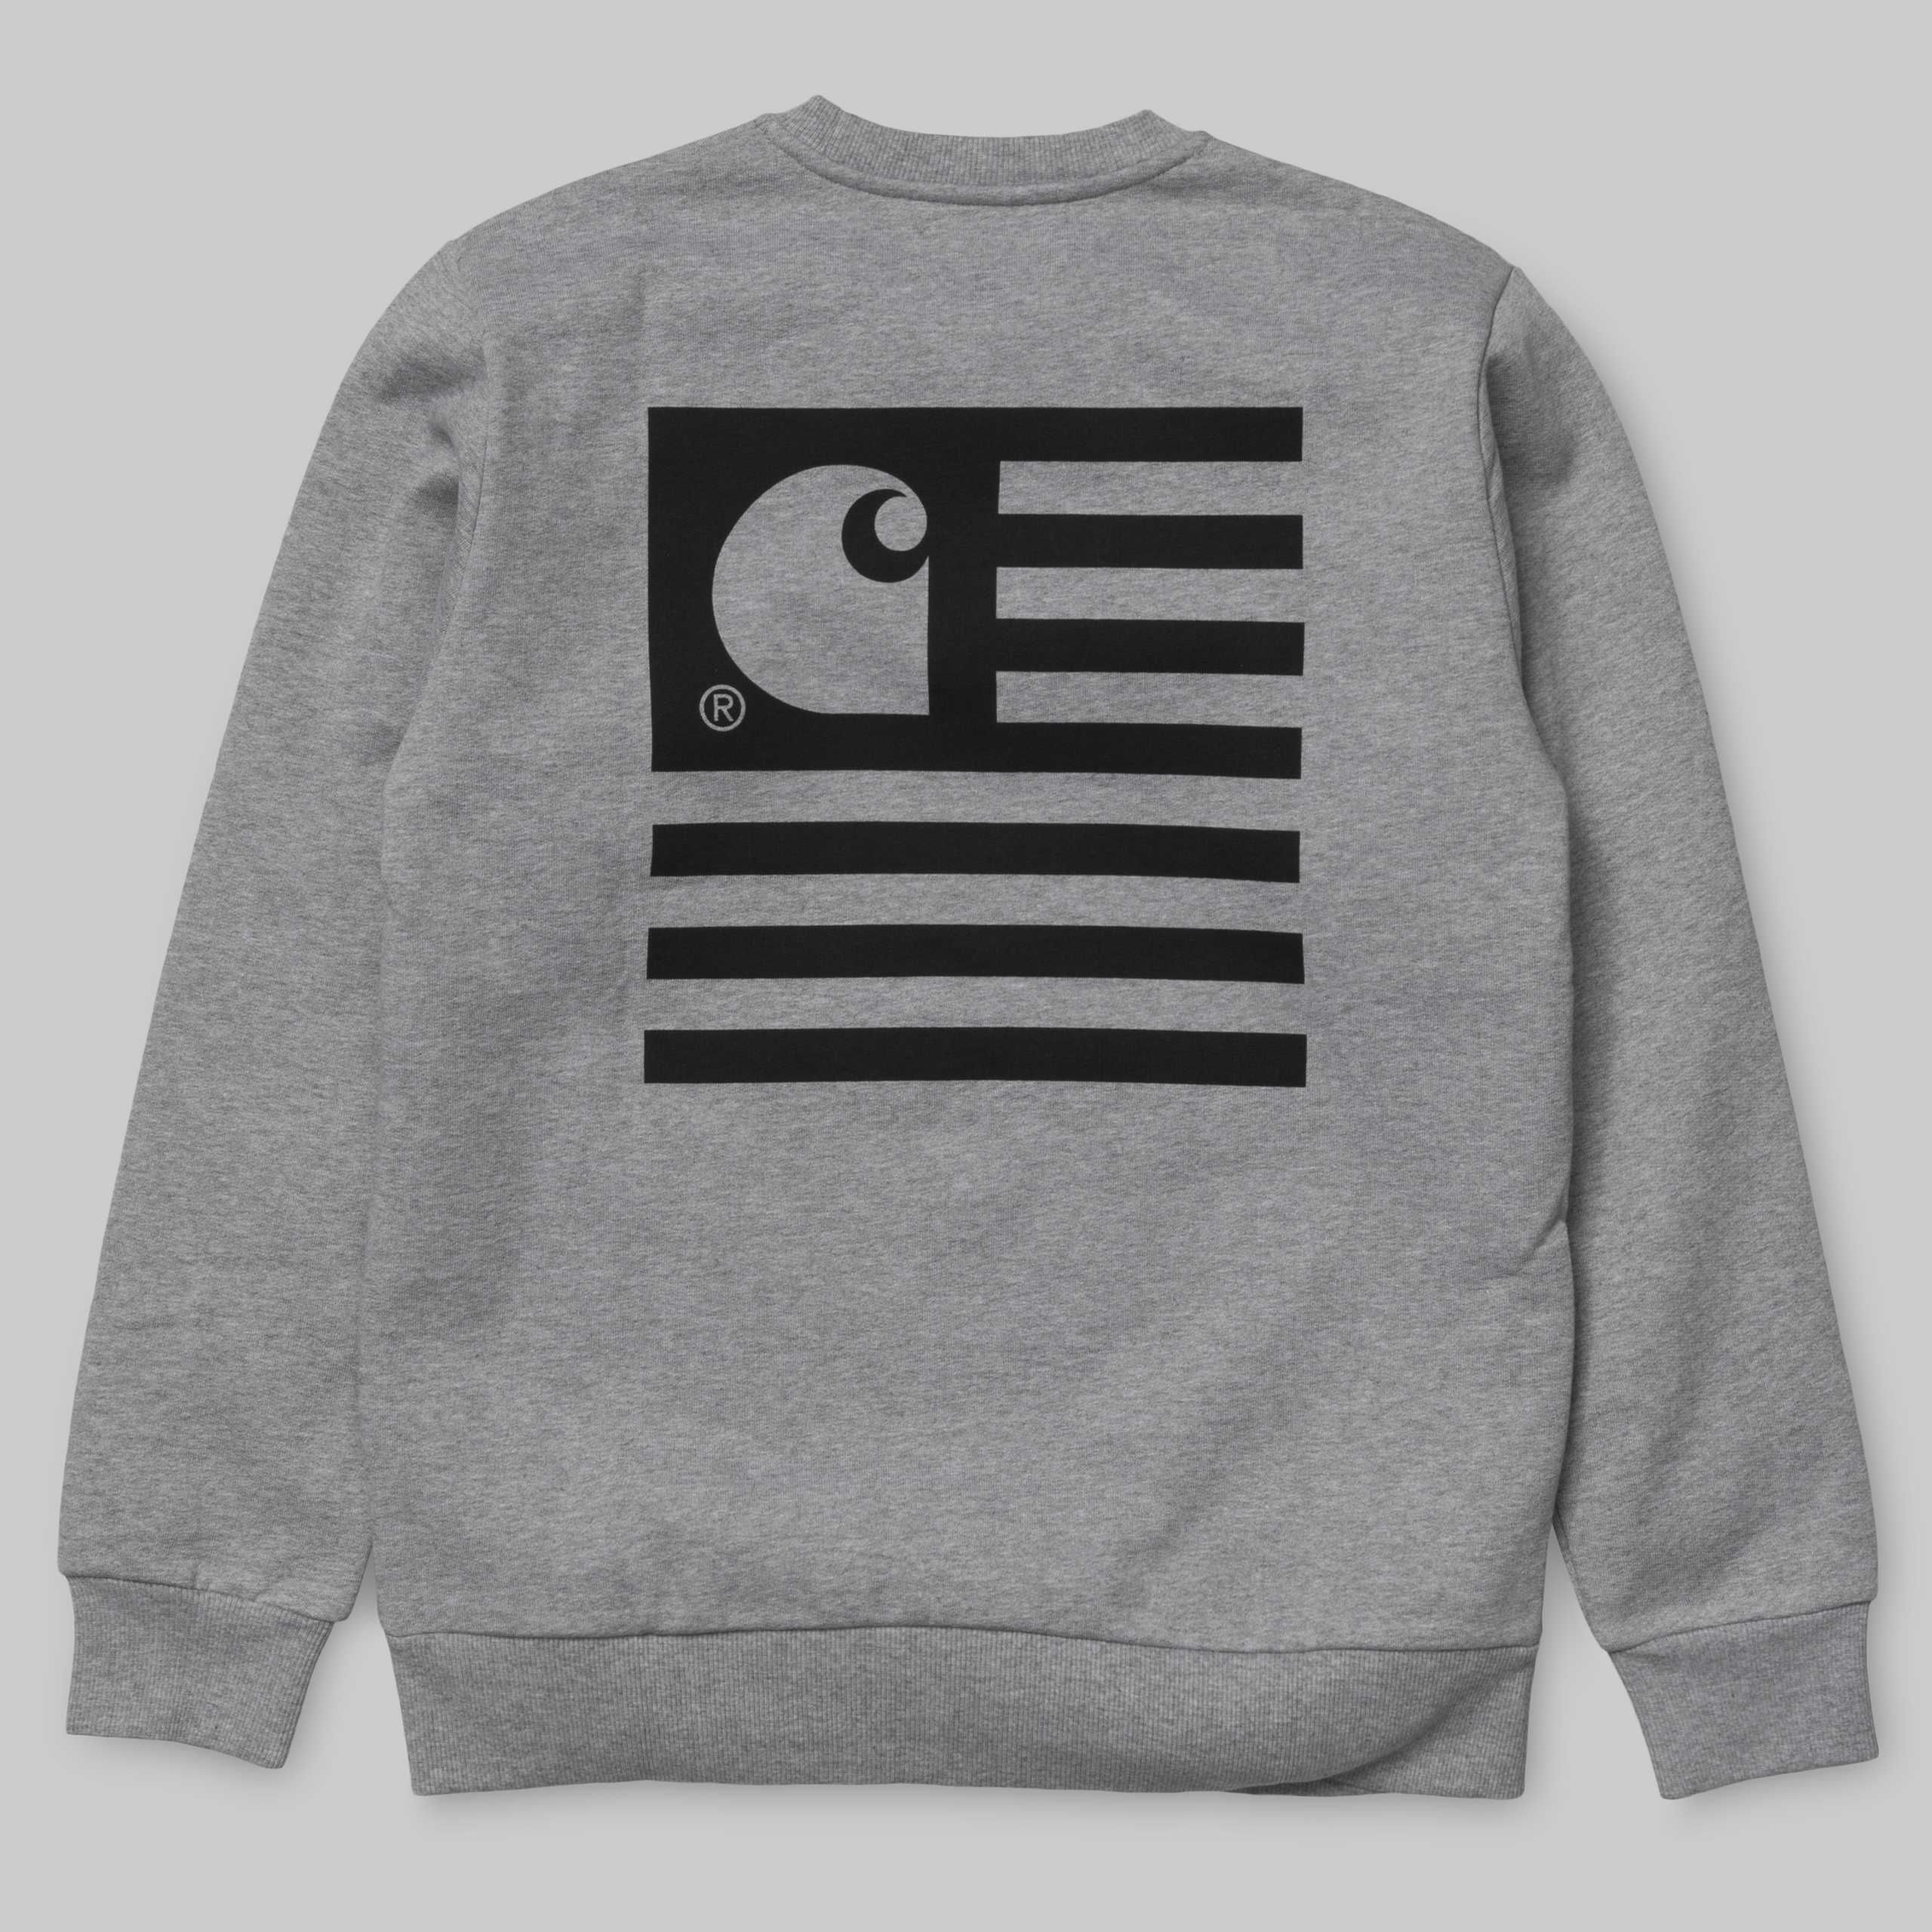 Carhartt Wip State Flag Sweatshirt Carhartt Wip Com Sweatshirts Heather Black Carhartt [ 2560 x 2560 Pixel ]